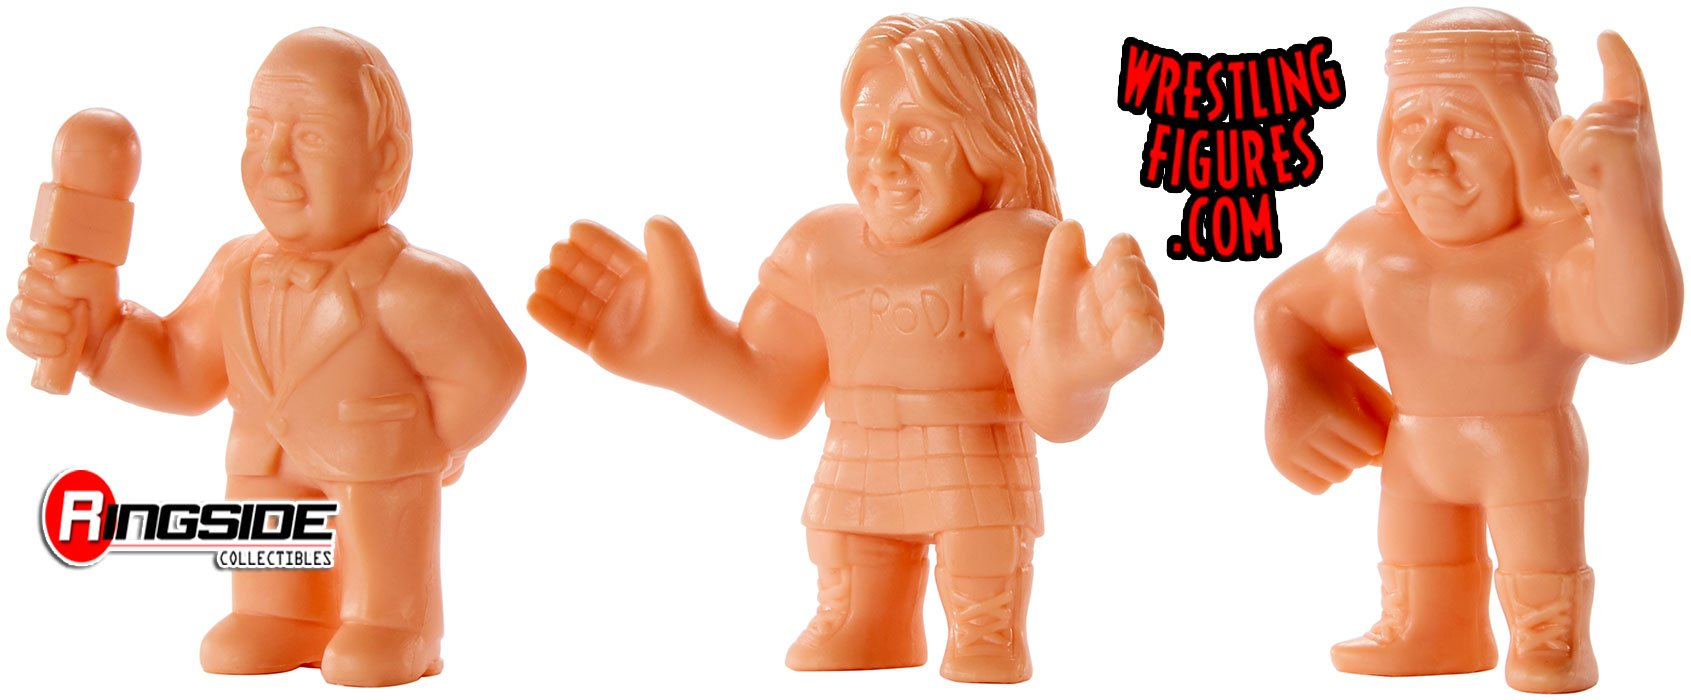 WWE Legends Complete Set of 12 Figures 2017 Mattel M.U.S.C.L.E